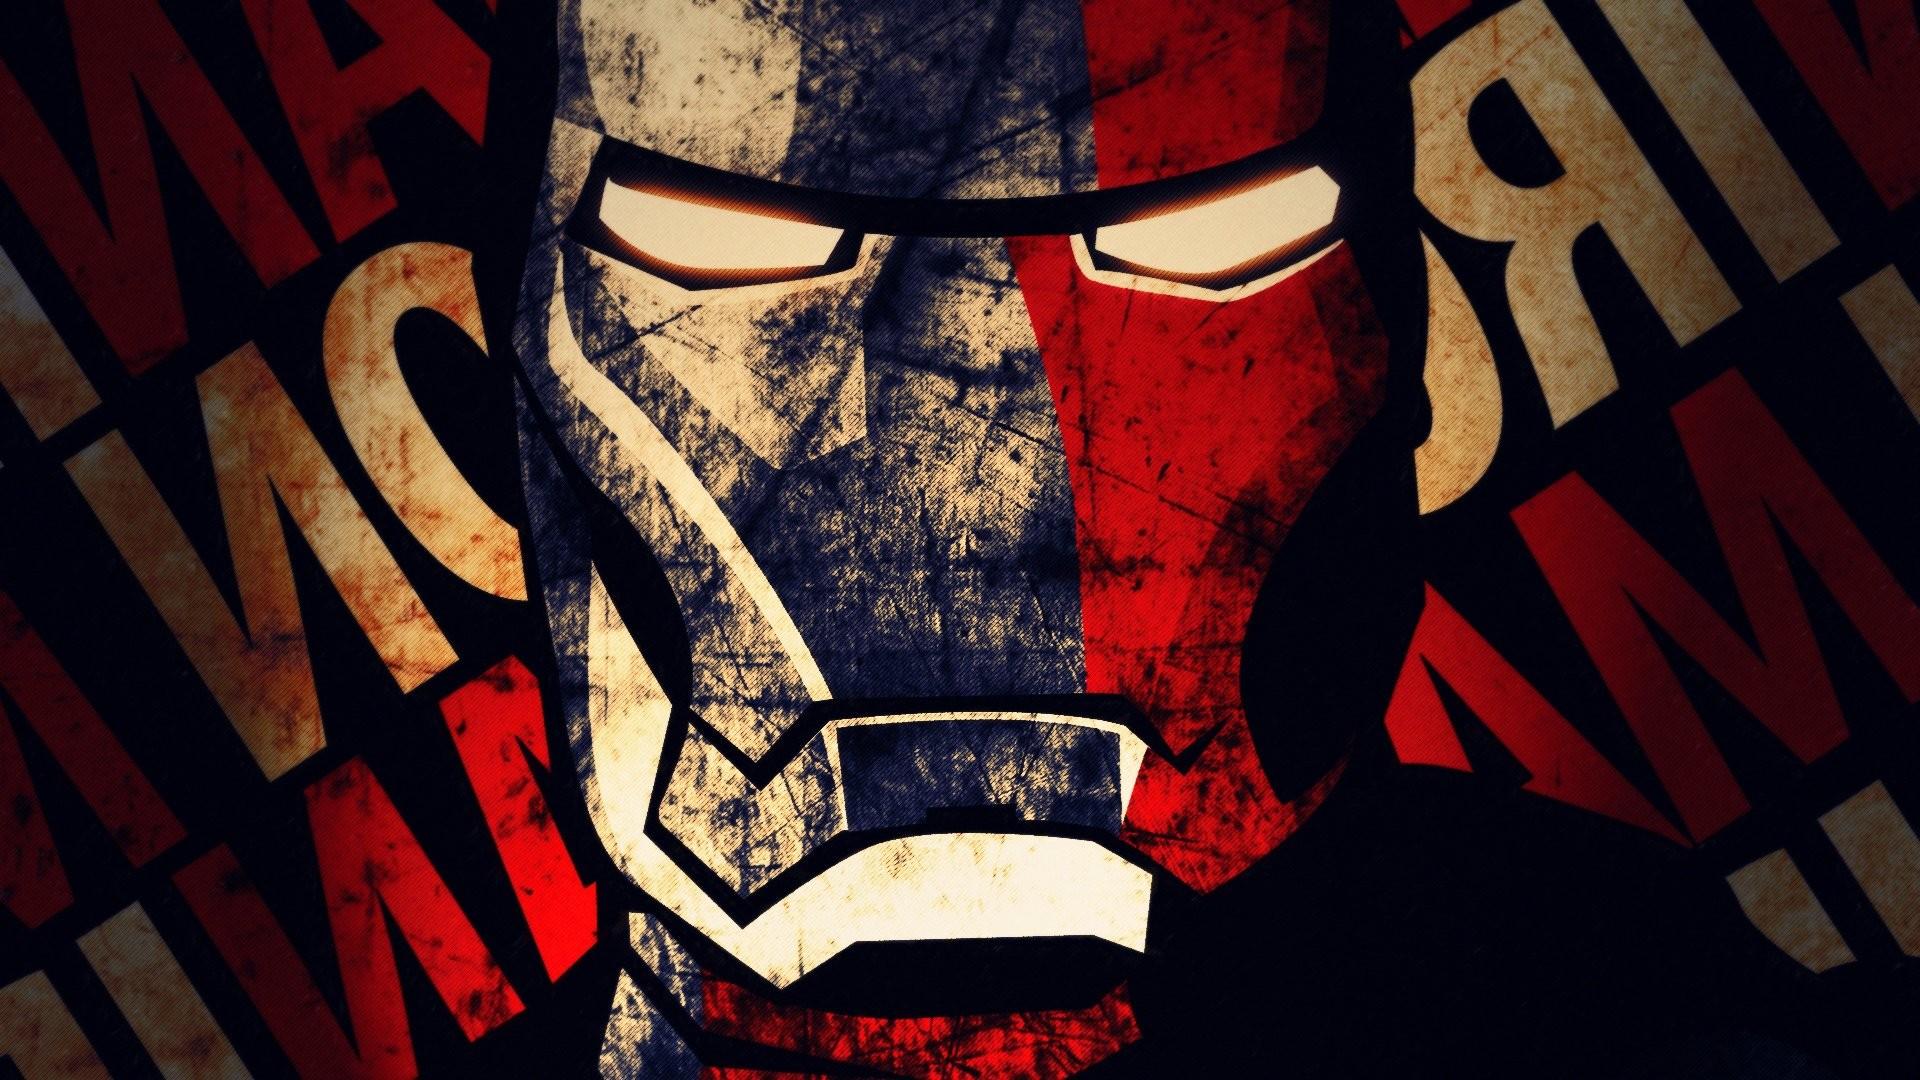 Comic wallpaper download free amazing wallpapers for - Iron man cartoon download ...